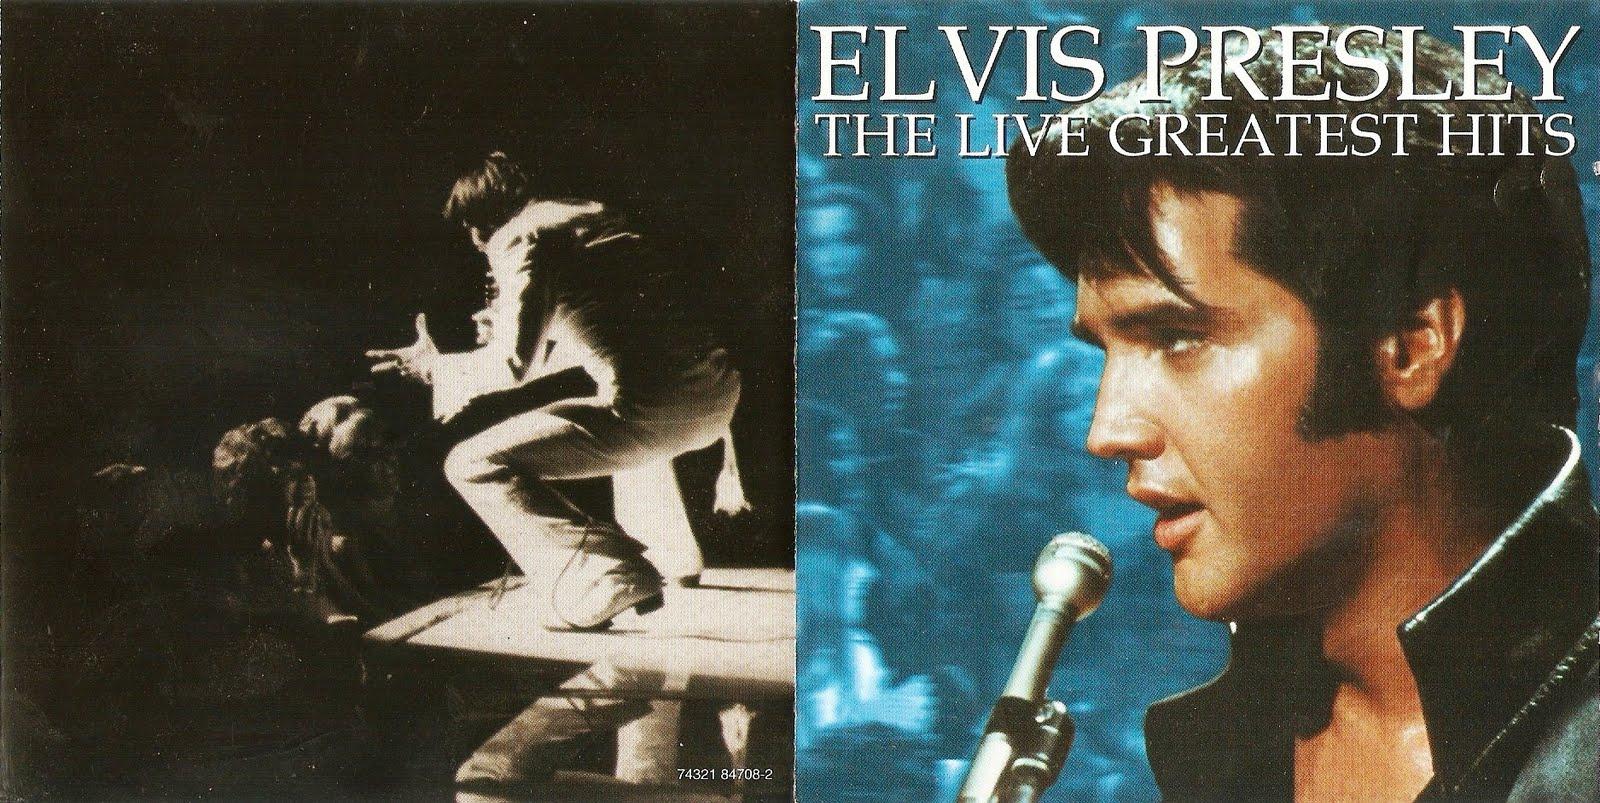 elvis presley greatest hits blogspot